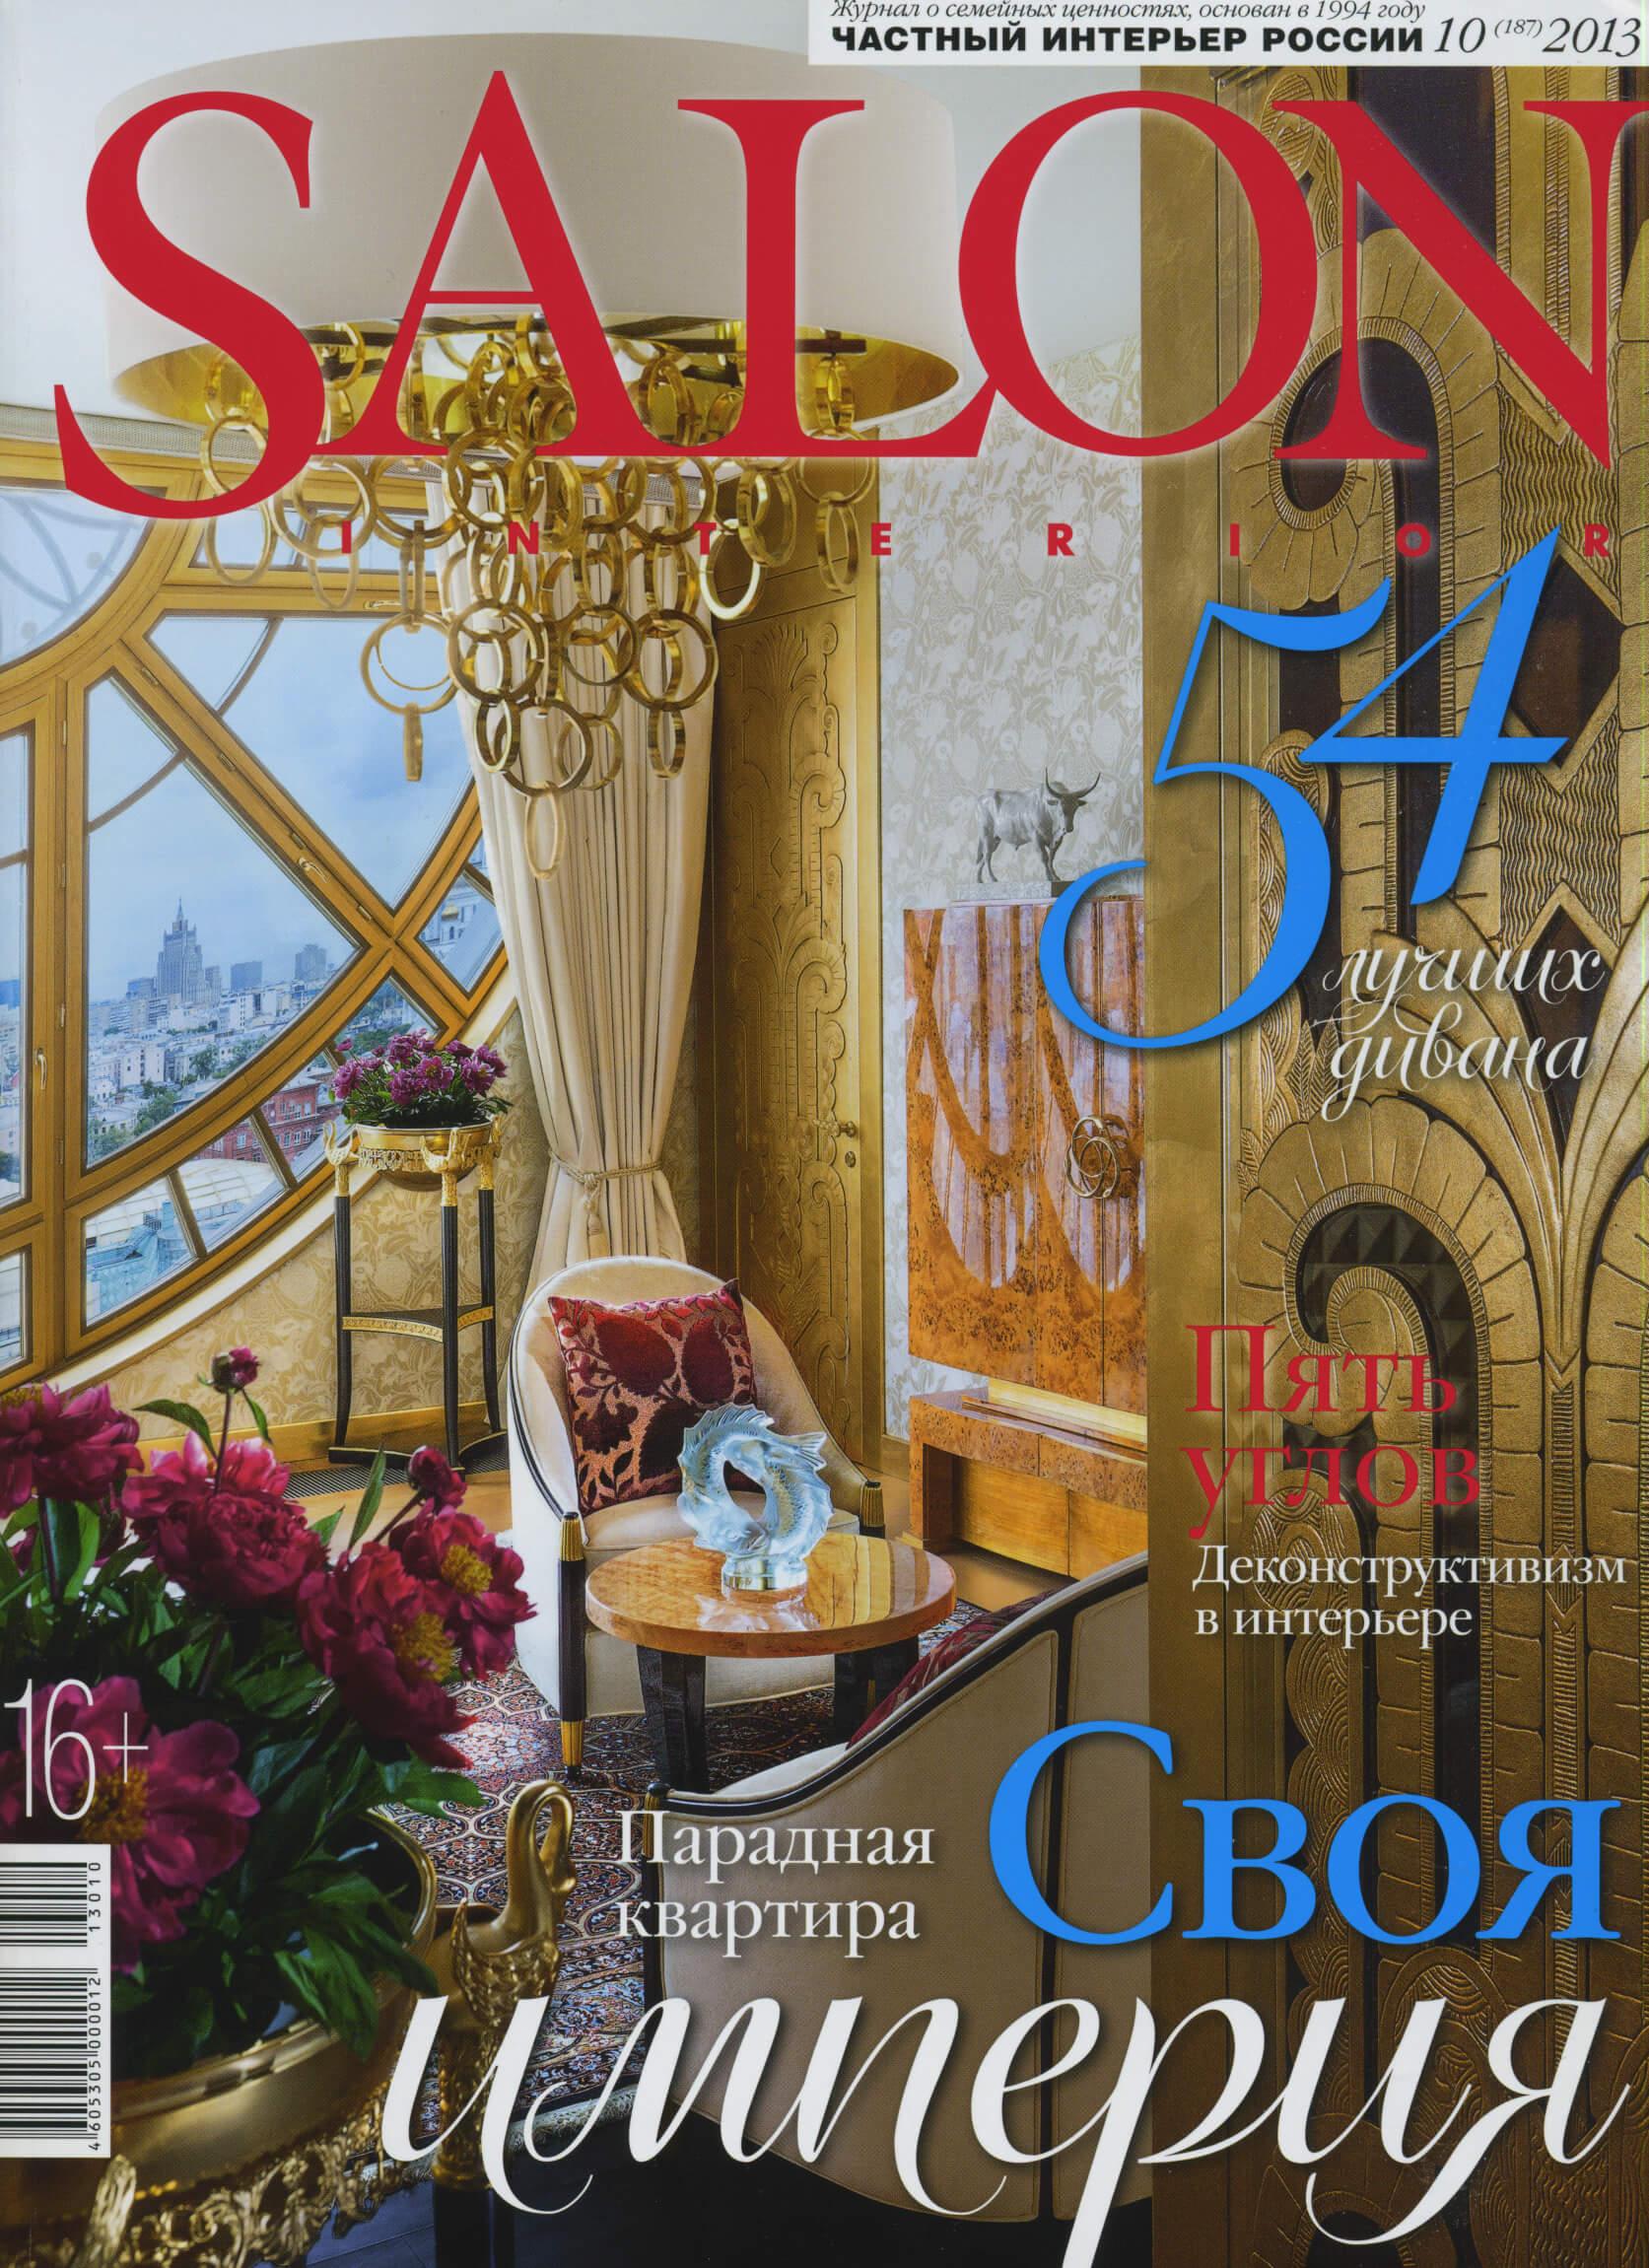 SALON 10 (187) 2013